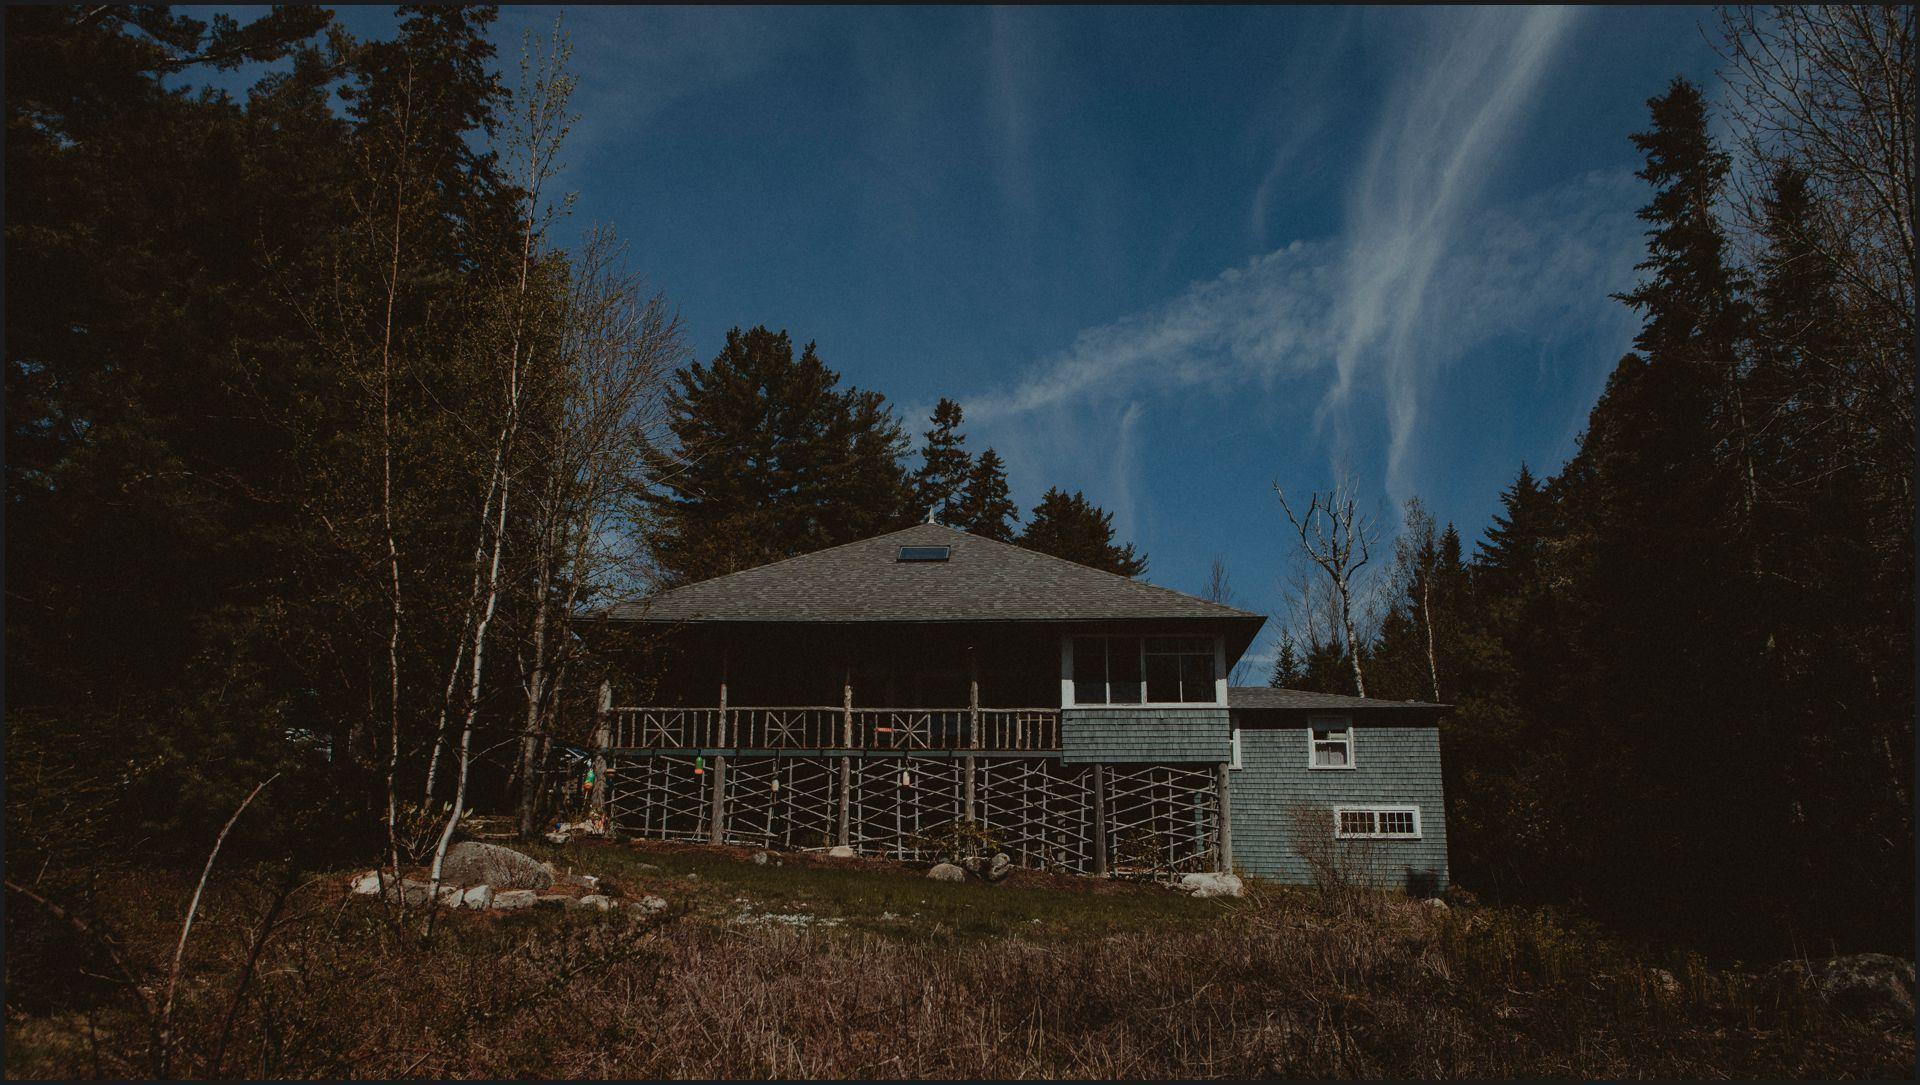 wedding venue, maine, acadia national park, cottage, ocean, blue sky, north american wedding